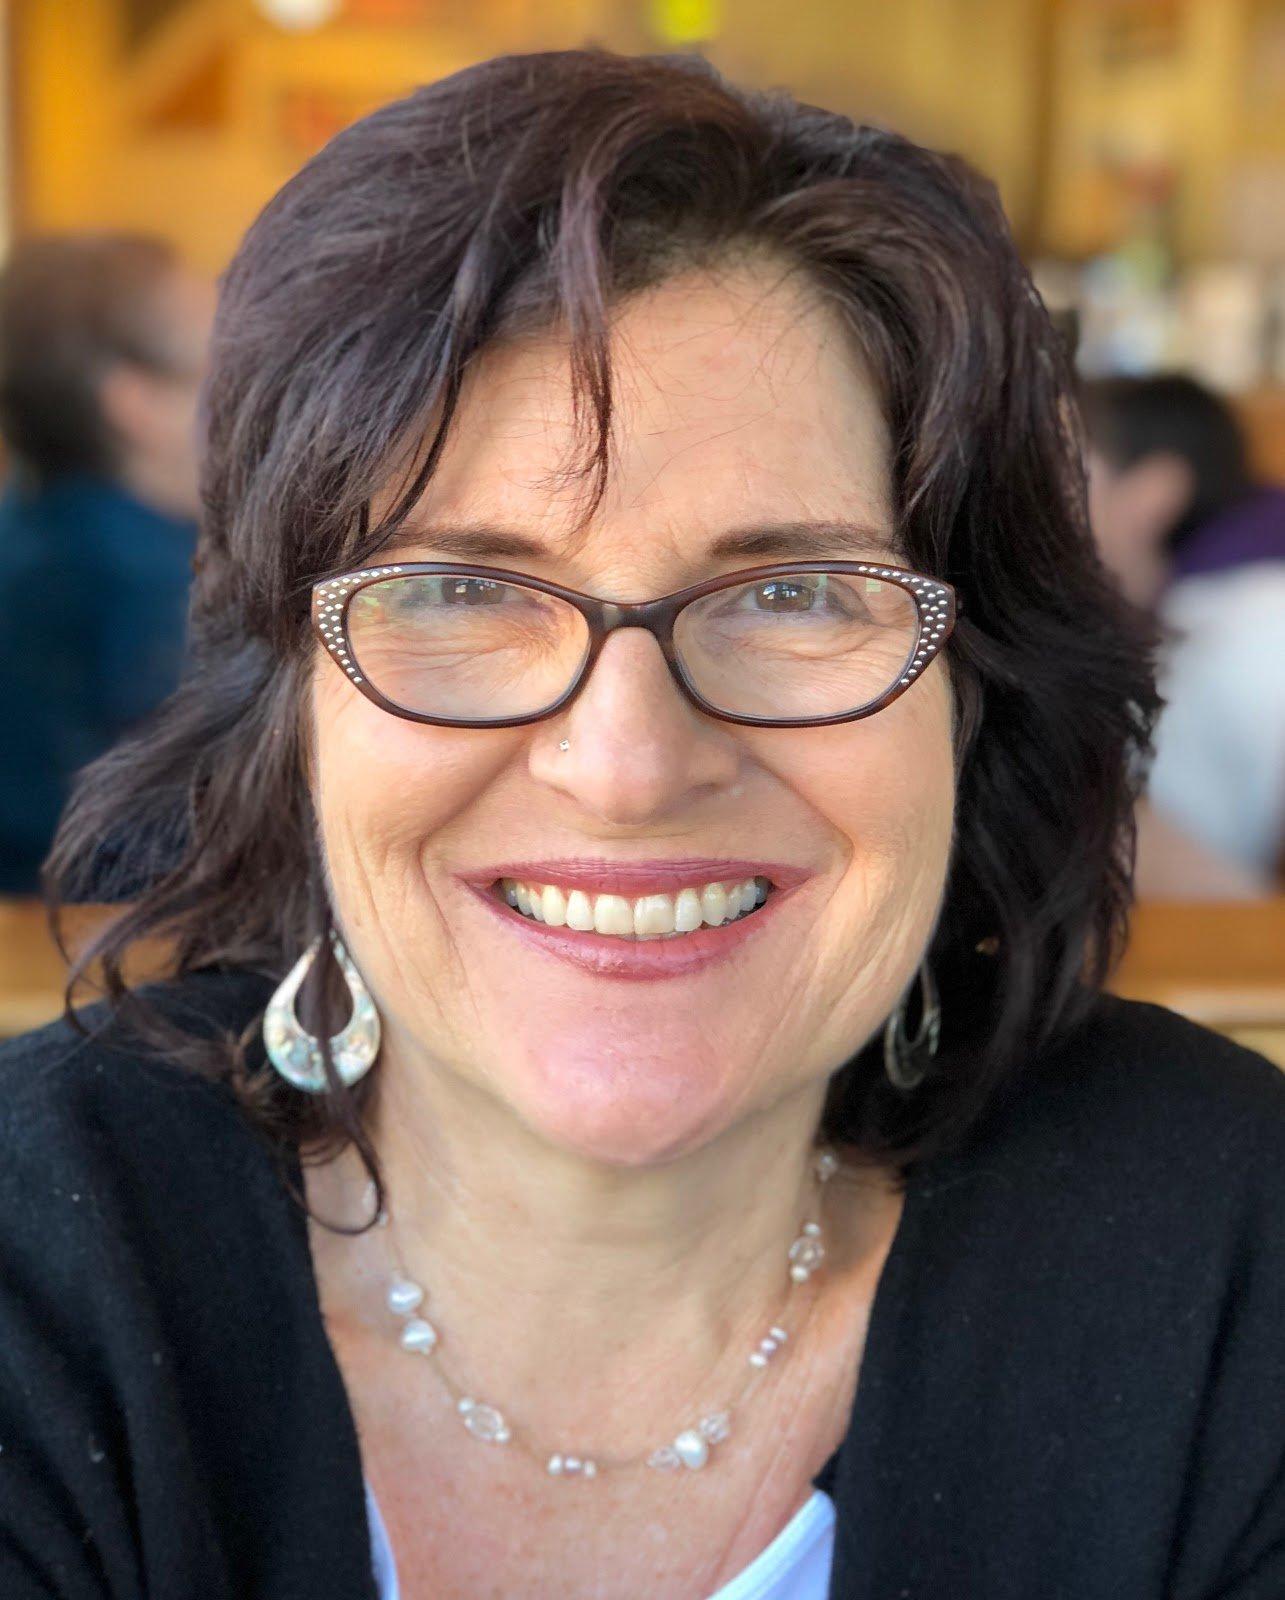 Noreen Greenblatt, Visionary Craniosacral Therapist, Certified Hakomi Practitioner